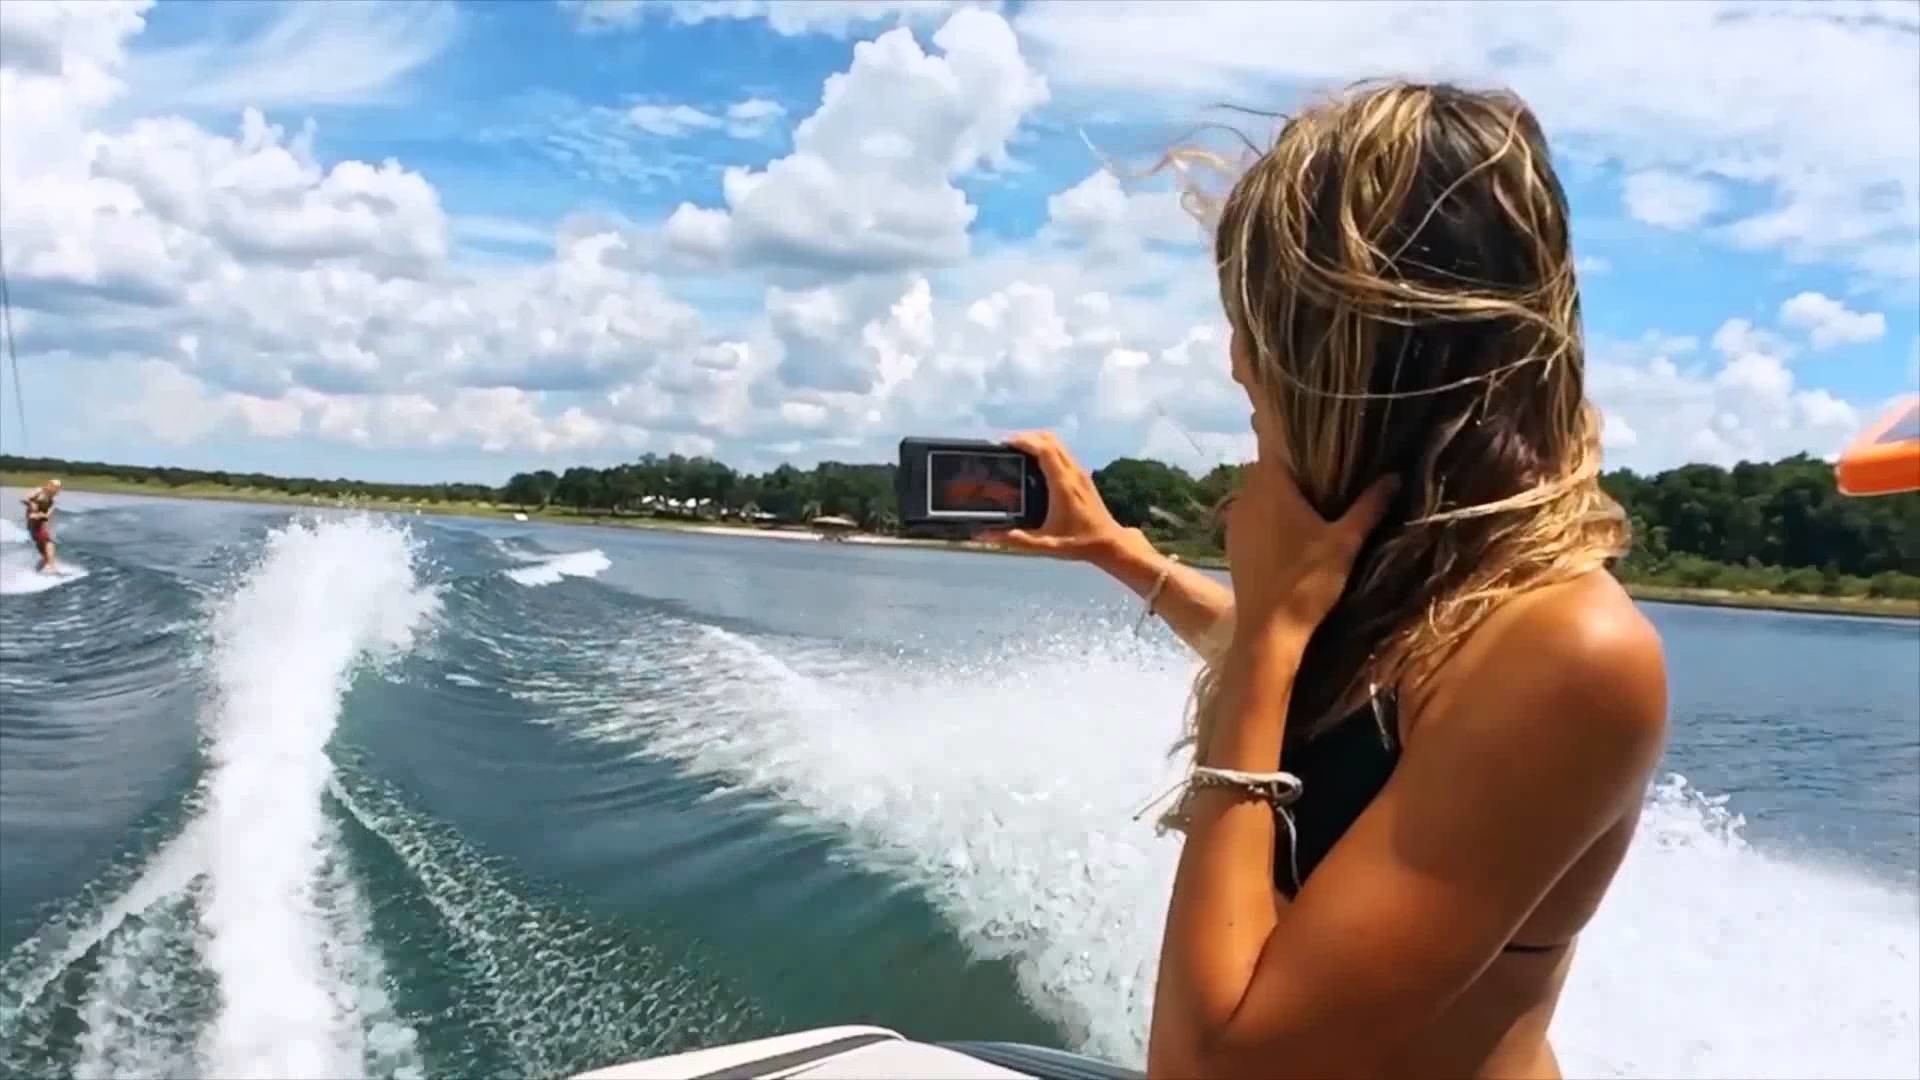 Hitcase iAdventure – filmat cu iPhone si carcasa Hitcase. Wakeboard Romania